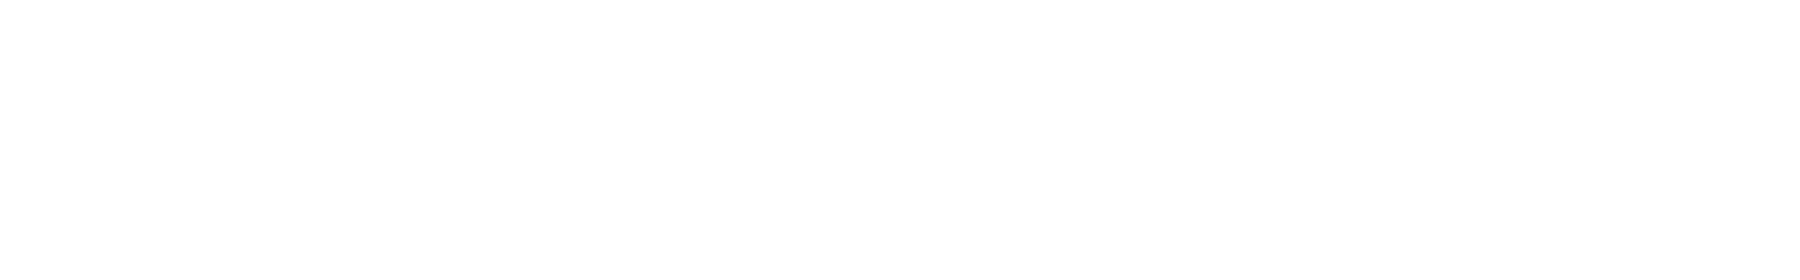 fx 010